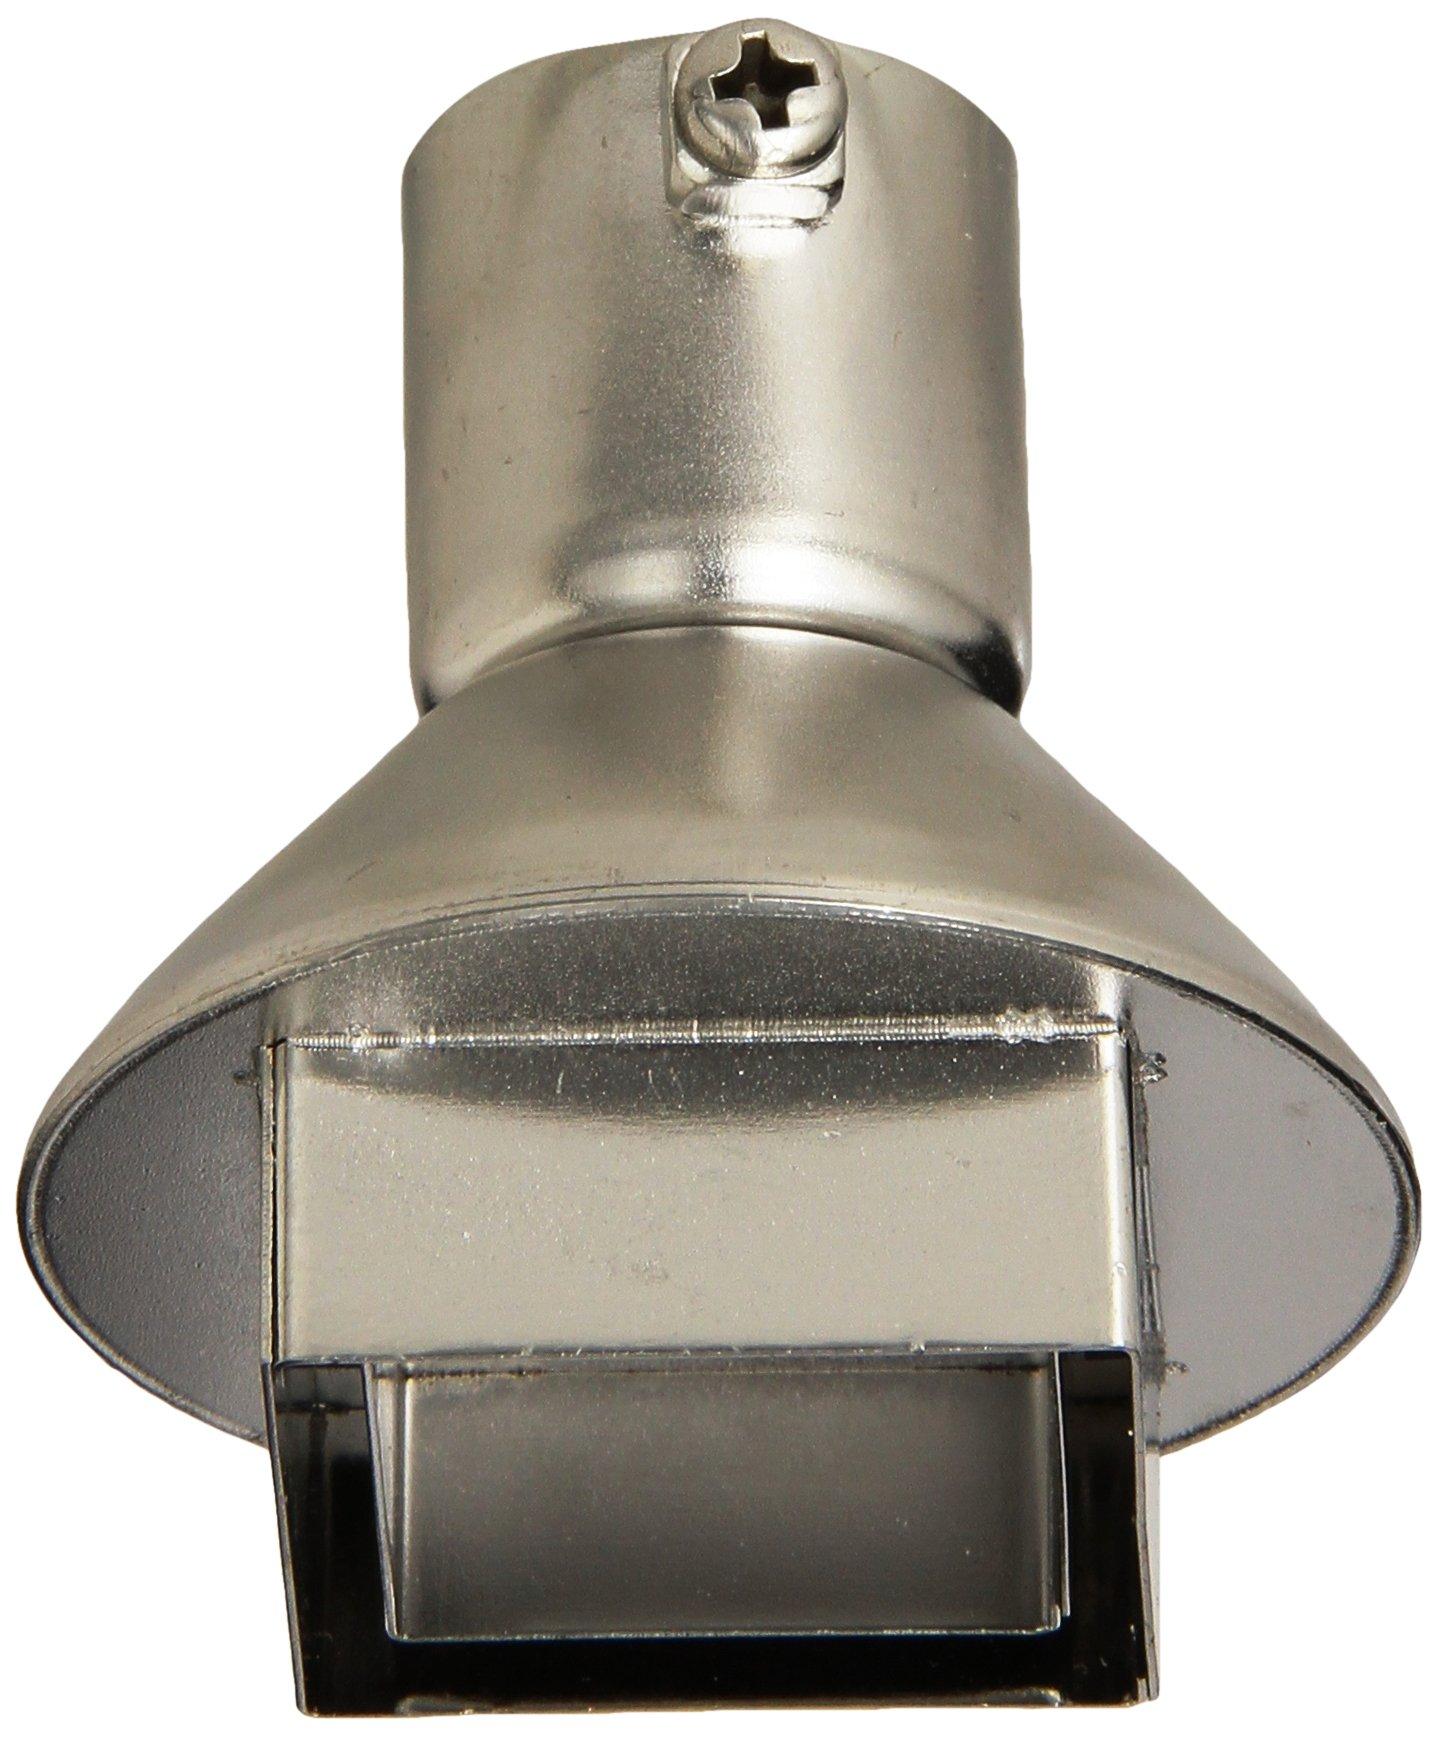 Rework Nozzle #1141 11.5 x14mm PLCC